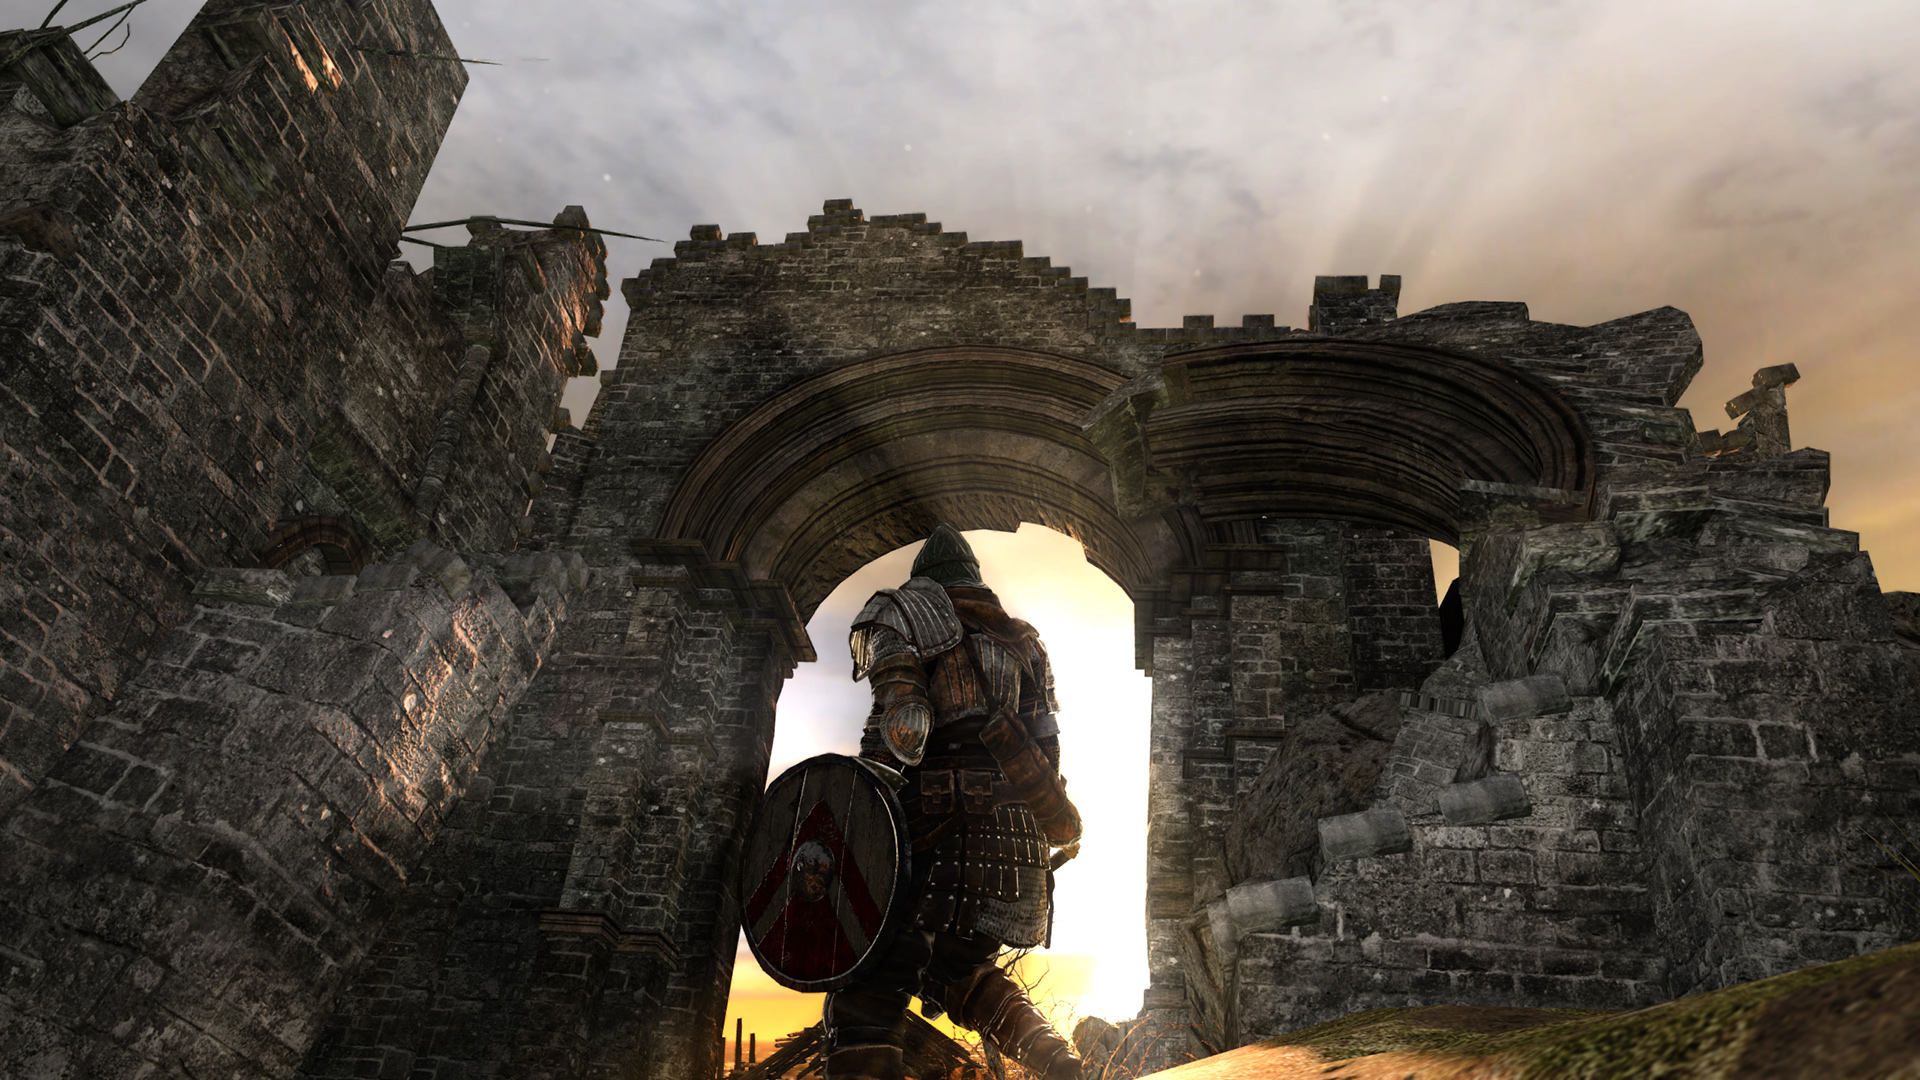 http://dl.pcgamer.com/darksouls2/godrays.jpg